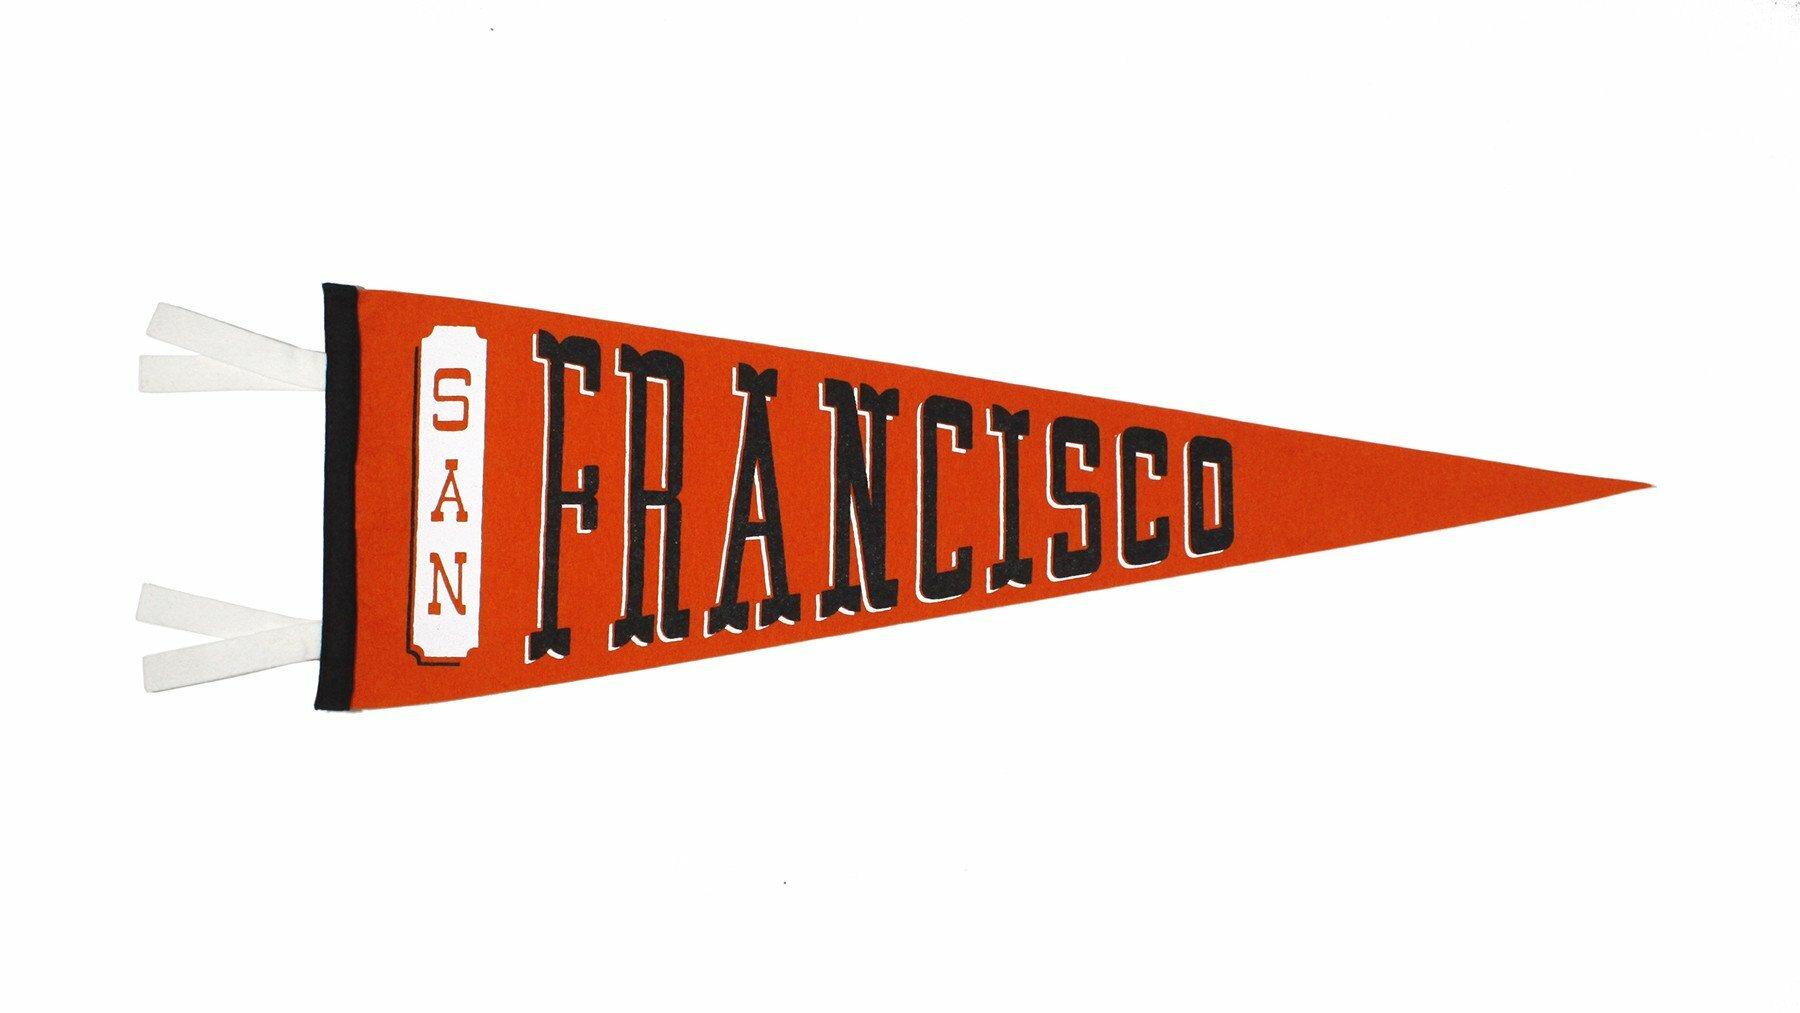 SAN FRANCISCO Pennant